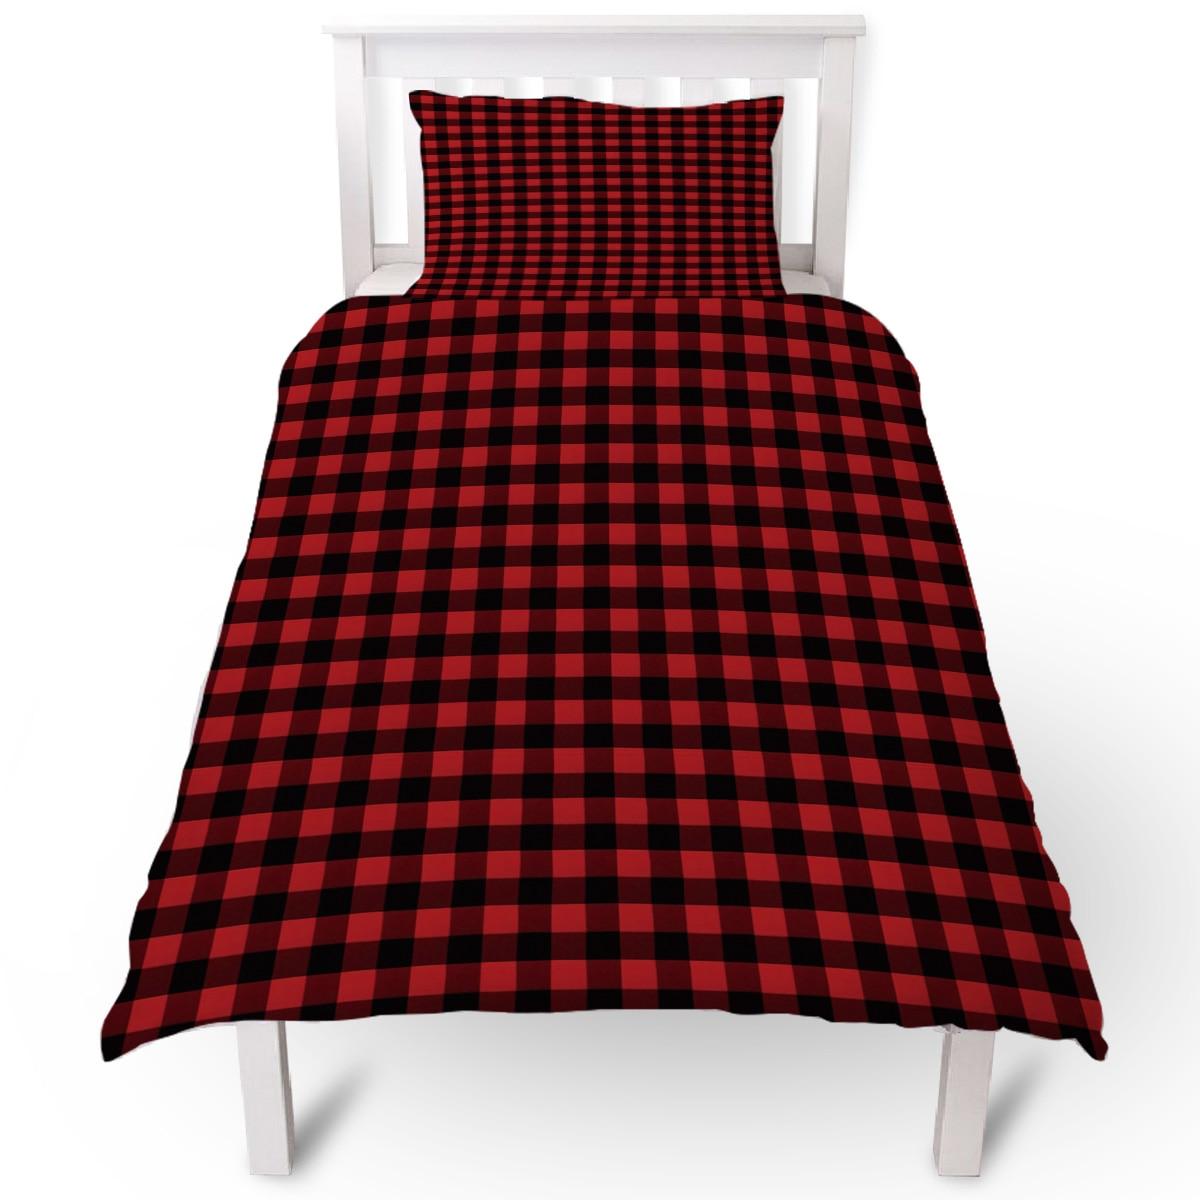 Black Red Plaid Duvet Cover Pillow Case Quilt Cover Set Bedclothes Single Bedding Sets For Bed Duvet Cover Aliexpress